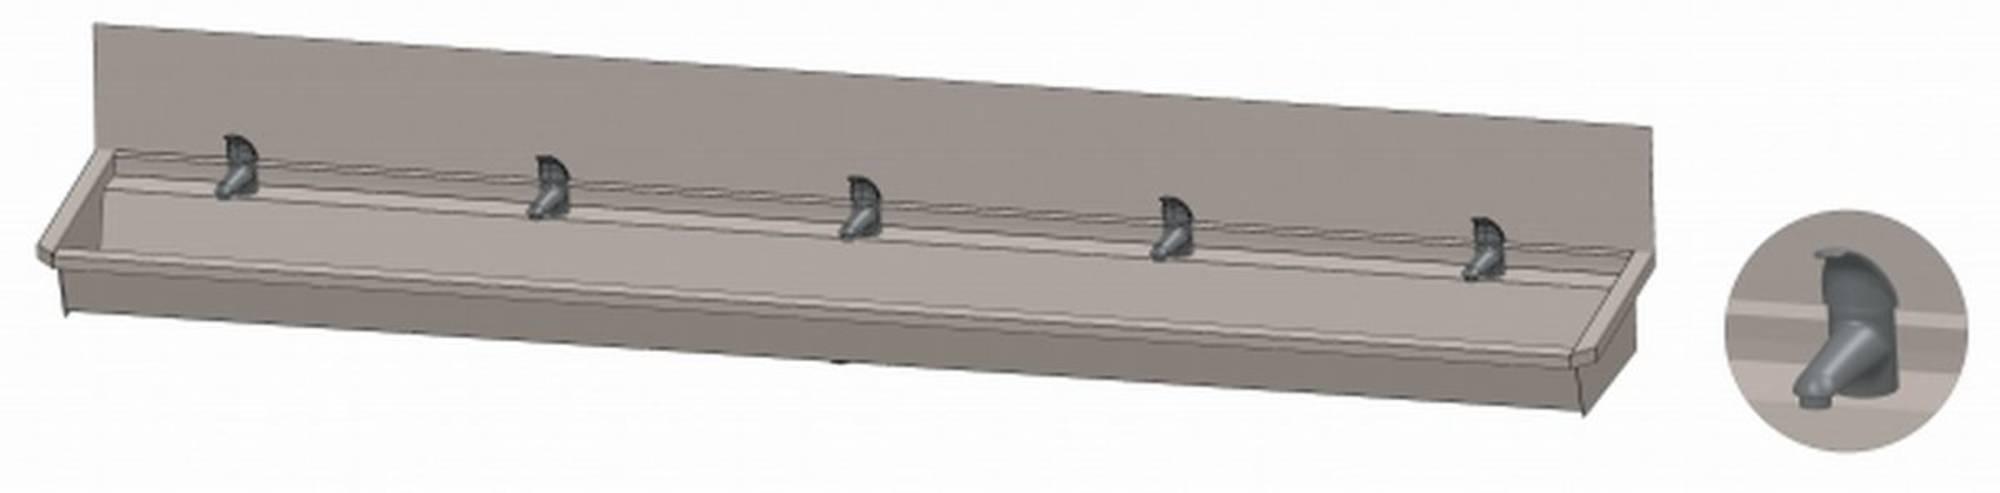 INTERSAN SANILAV wasgoot met spatbord 300 cm. met 5 1-greeps kranen INOX 304 (305L4)